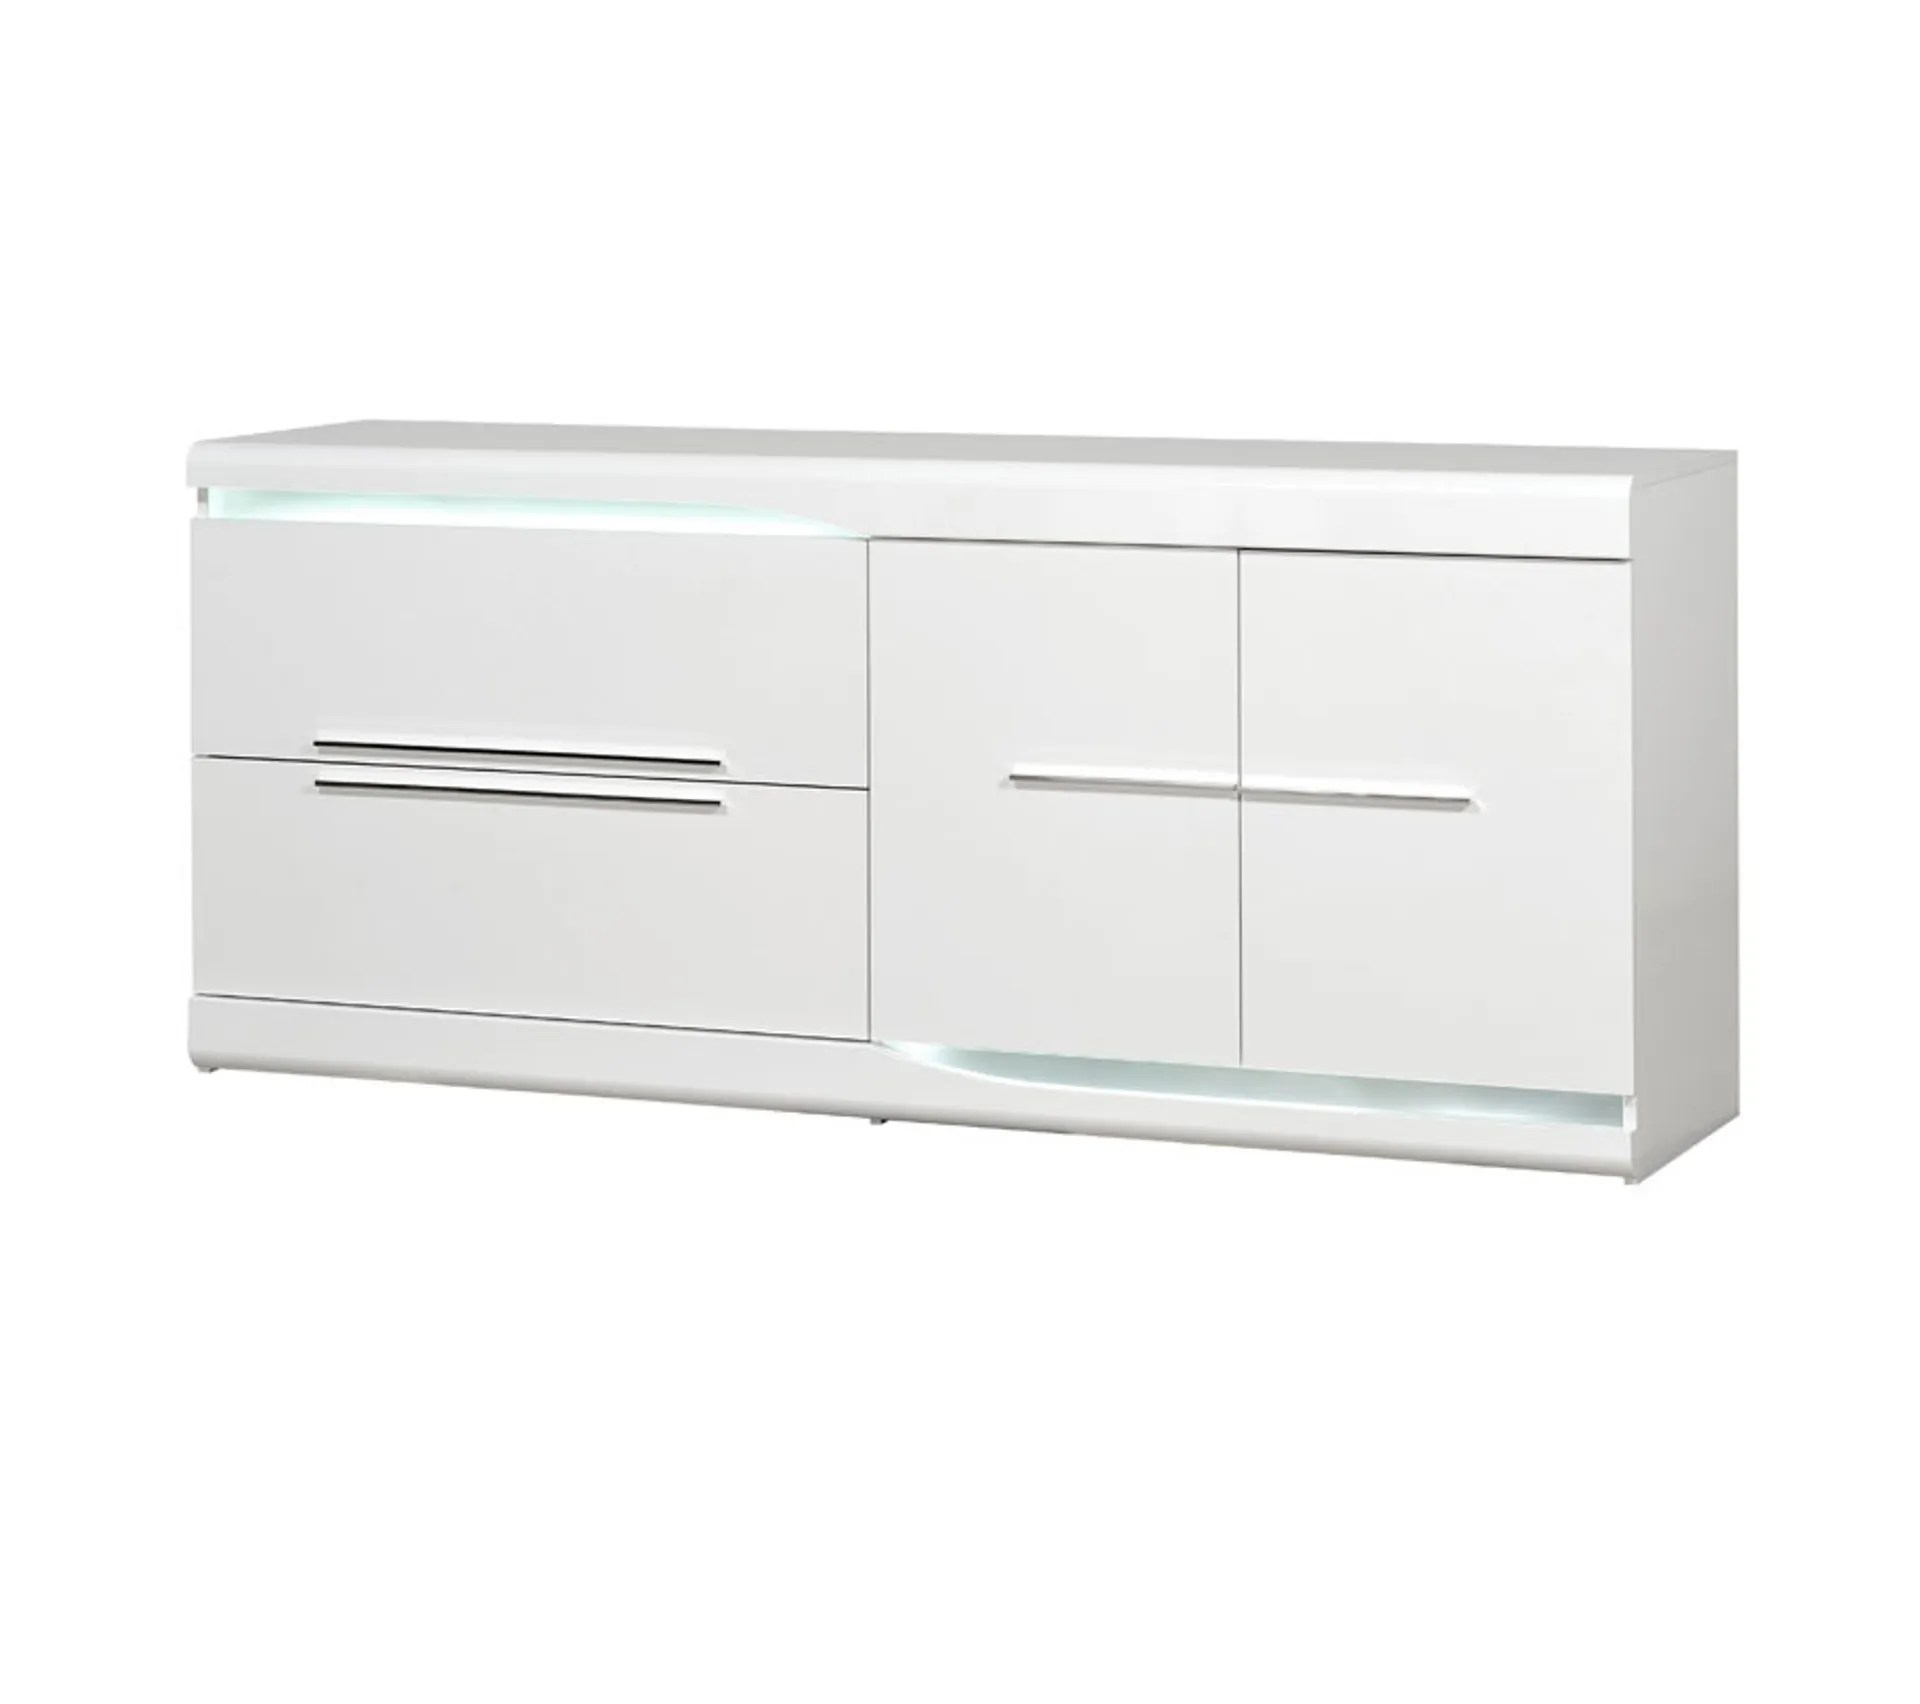 buffet 2 portes 2 tiroirs blanc laque brillant a leds pesmes